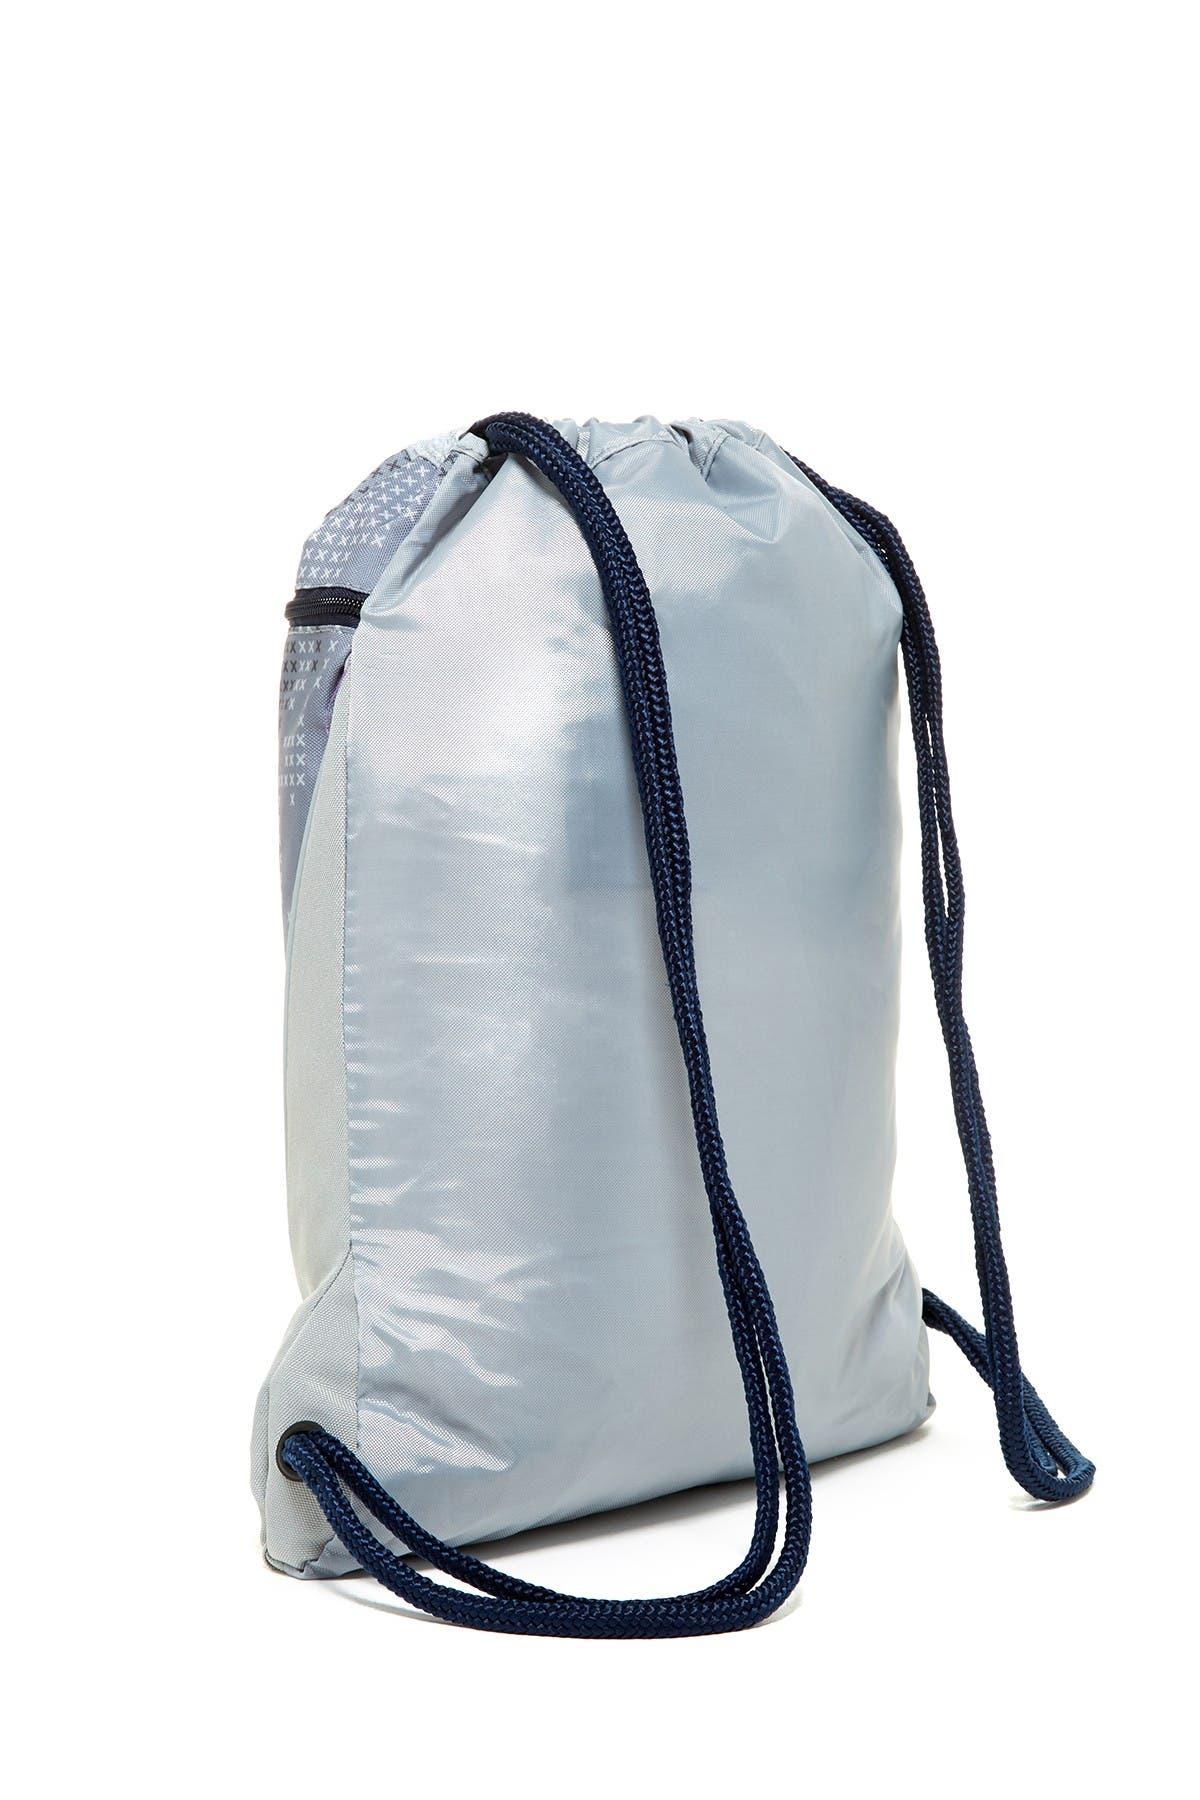 Image of PUMA Contender Carrysack